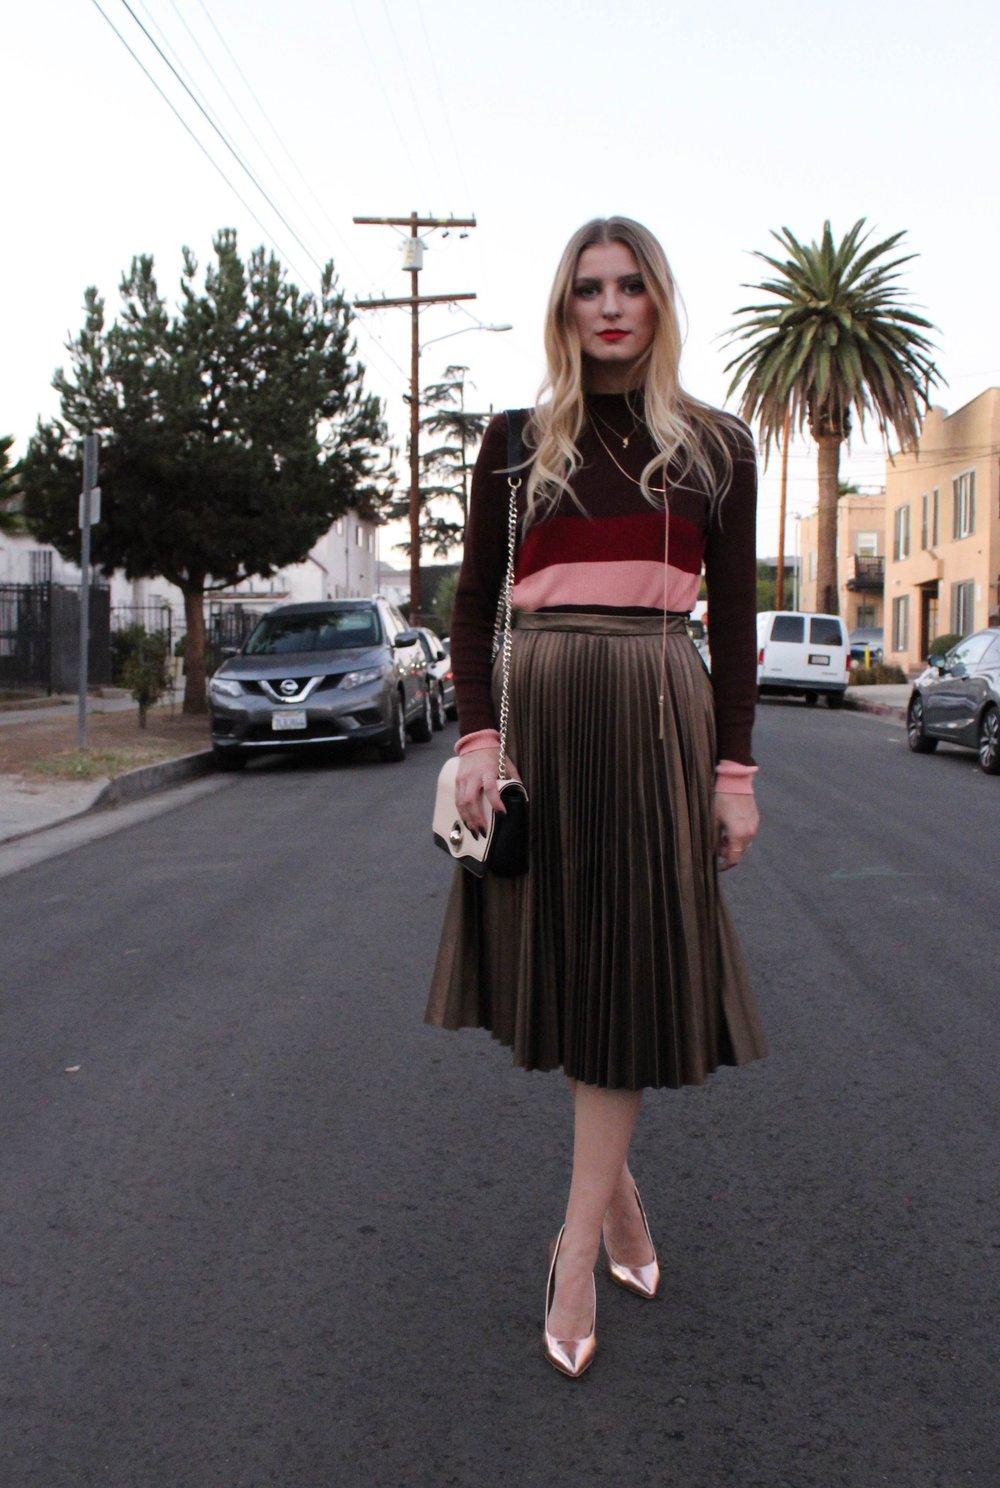 Skirt: Closet from Asos, Sweater: First & I from Asos, Shoes: Public Desire, Bag: Zara, Long Necklace: Aldo, Mermaid Necklace: Asos, Rings: Asos